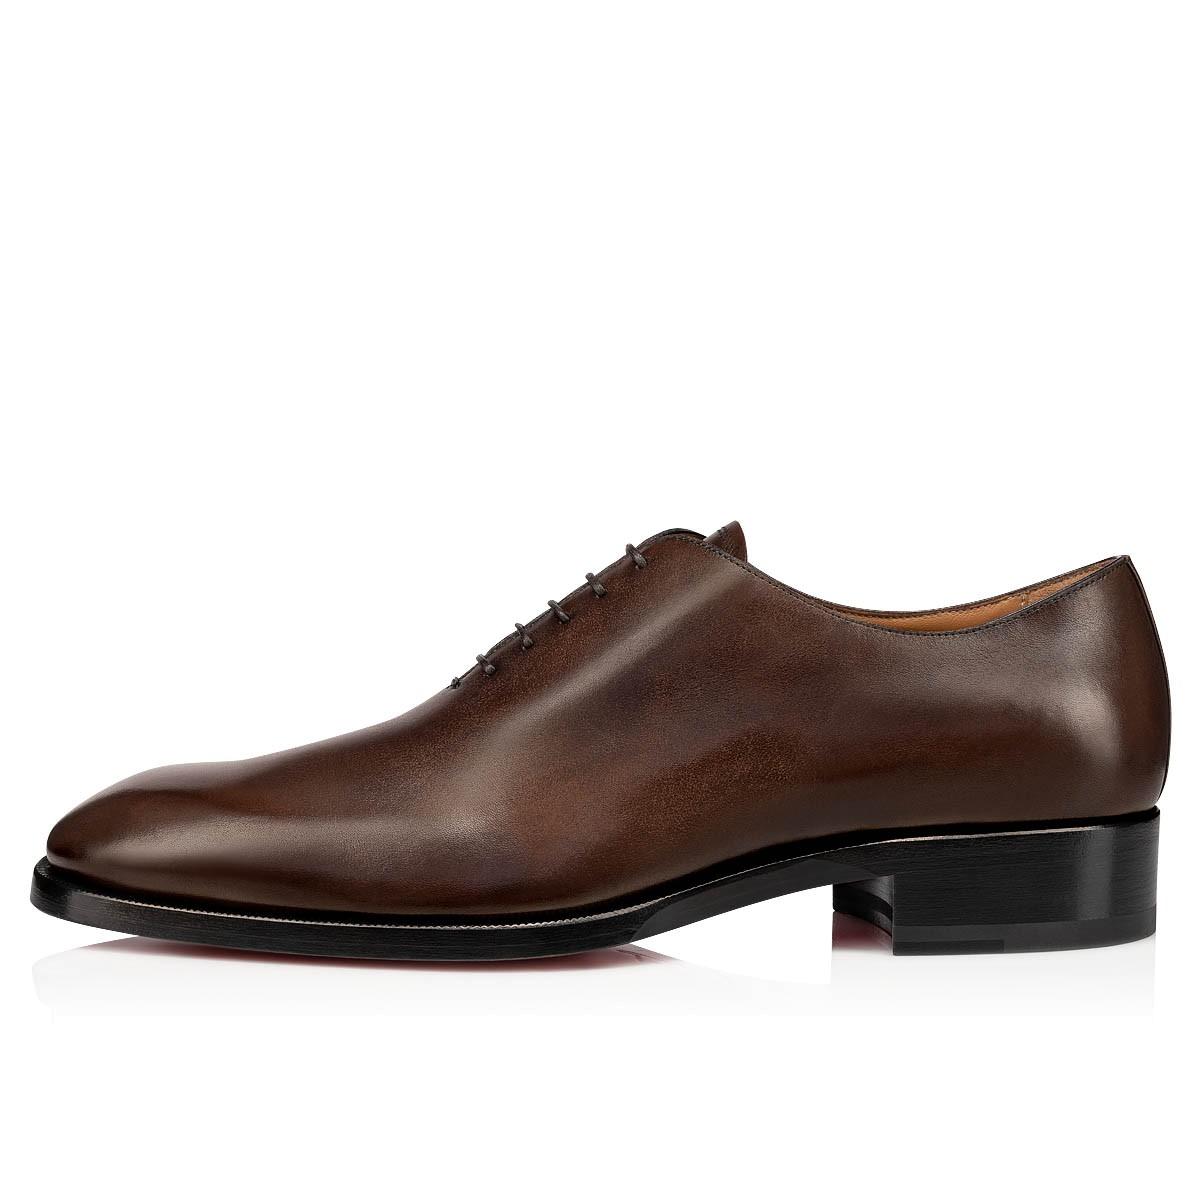 Shoes - Corteo - Christian Louboutin